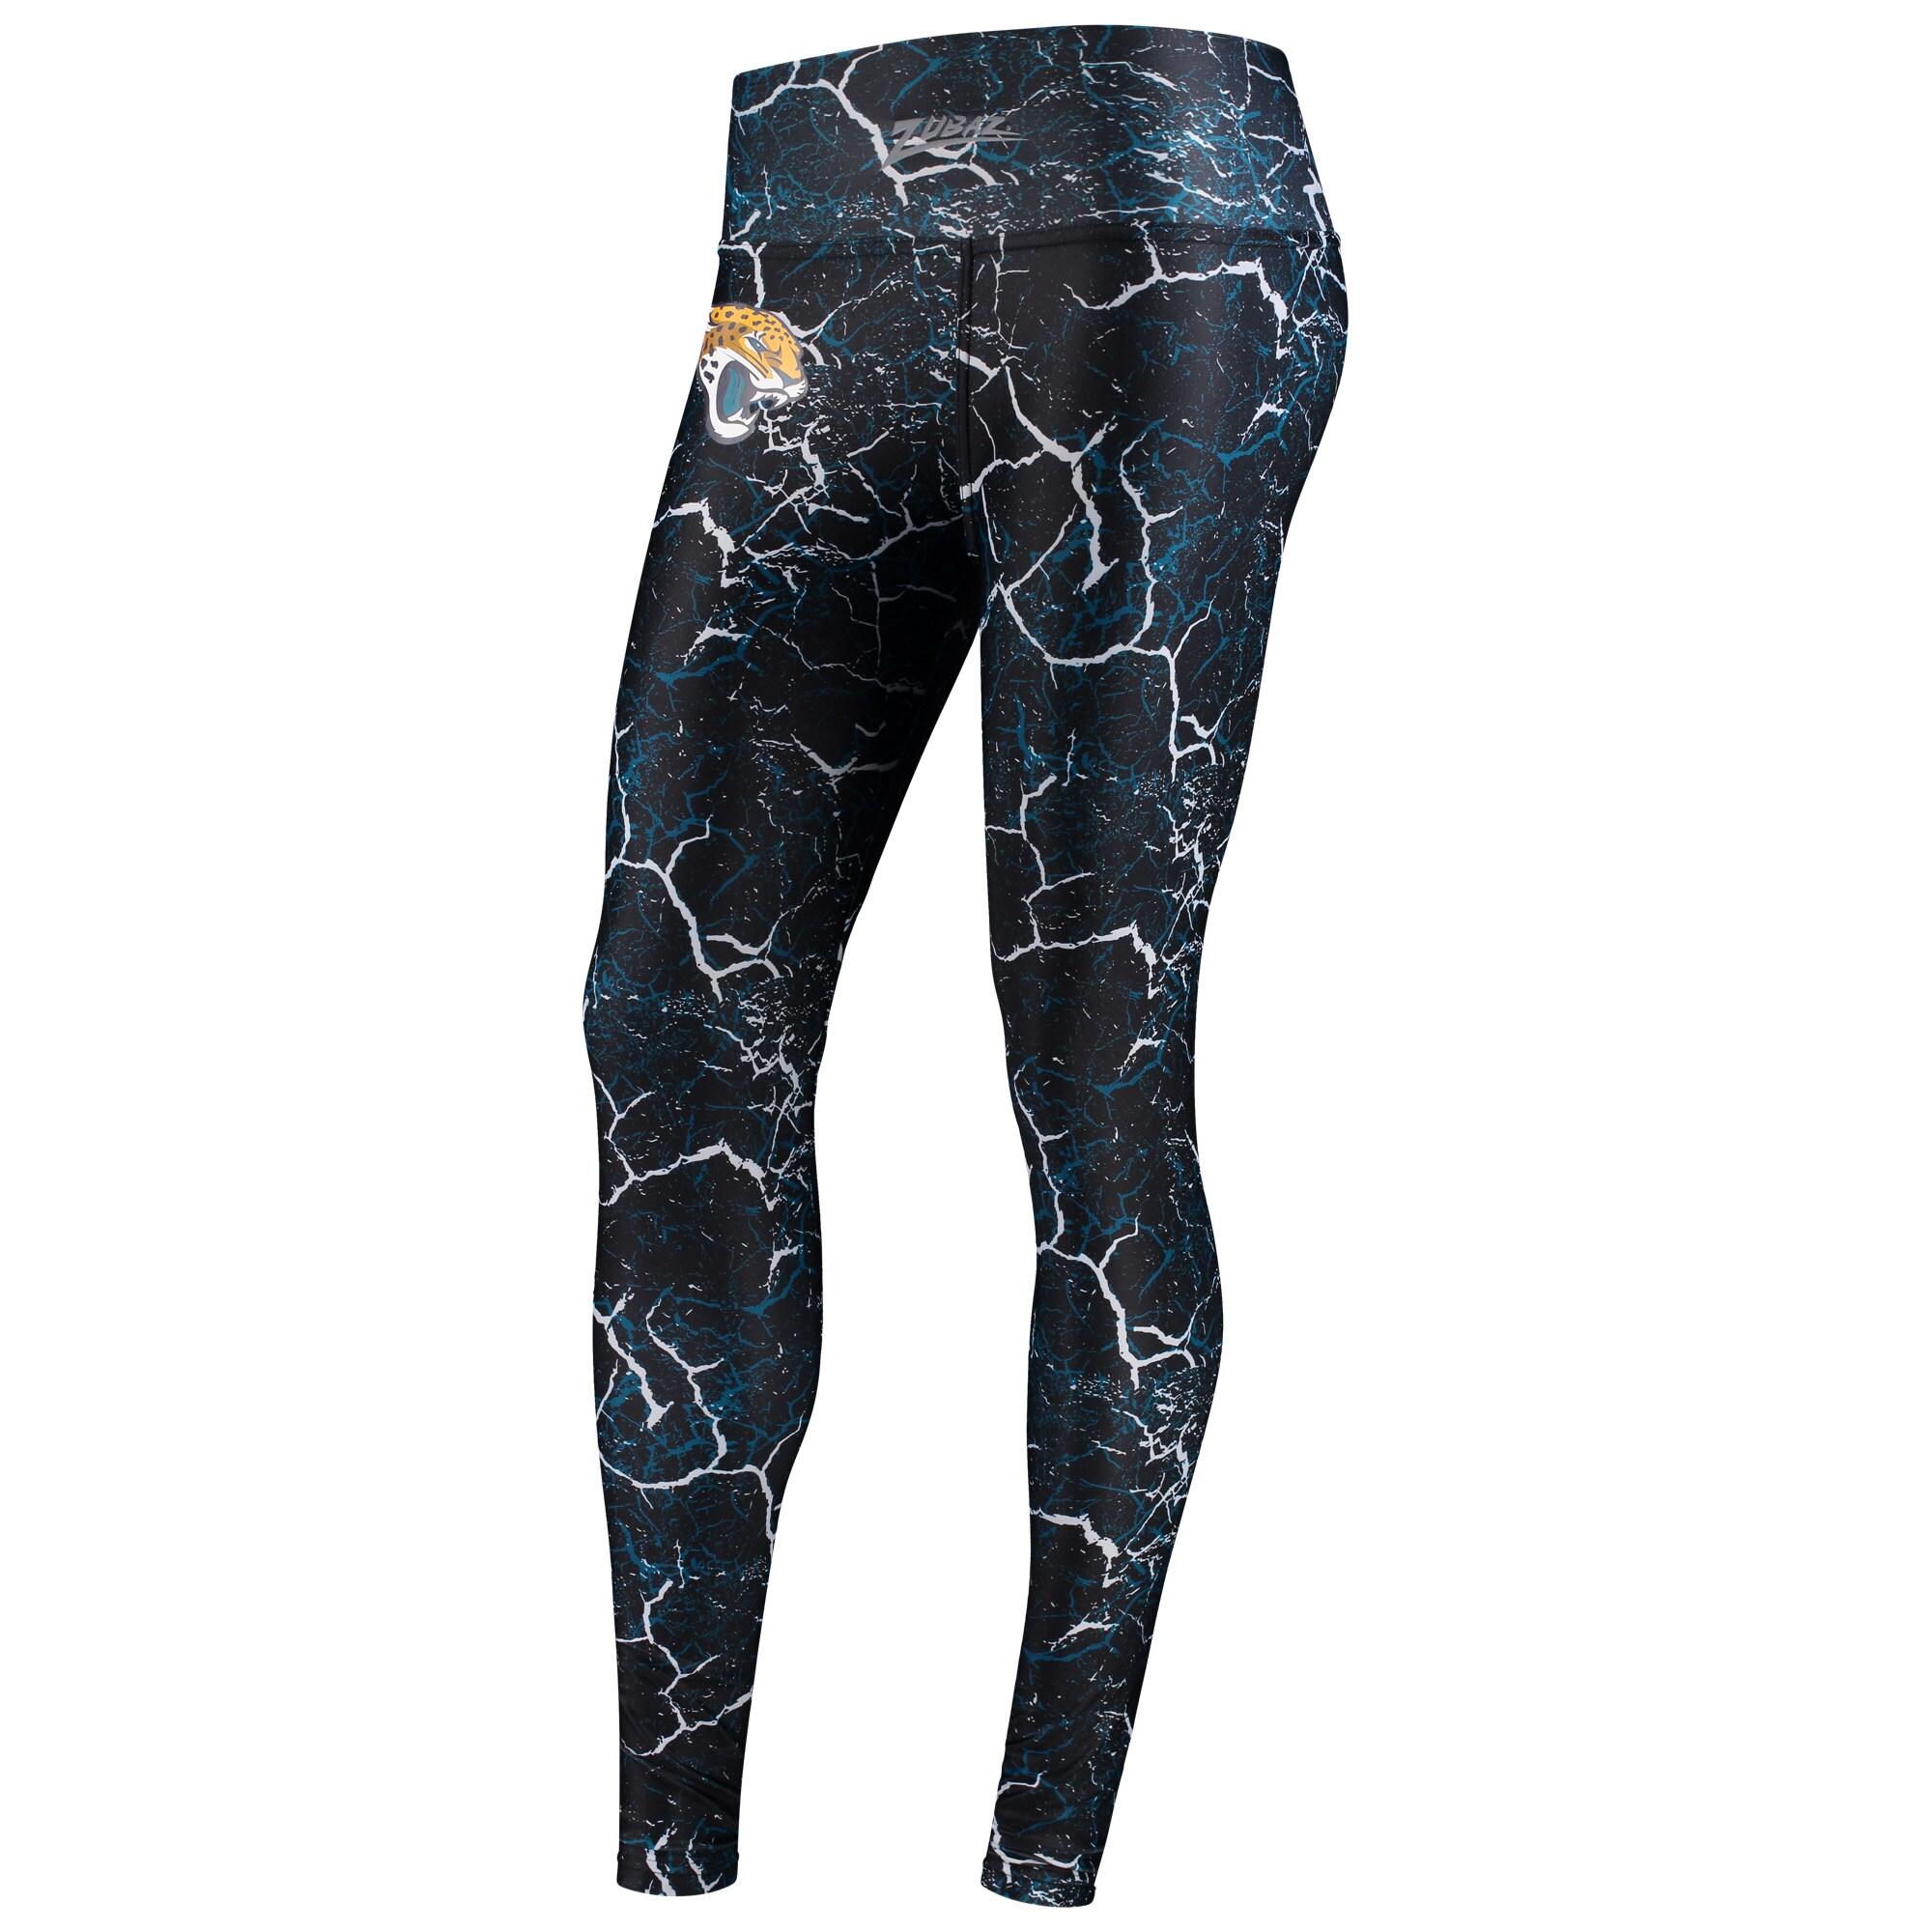 Jacksonville Jaguars Zubaz Women's Marble Leggings - Black/Teal